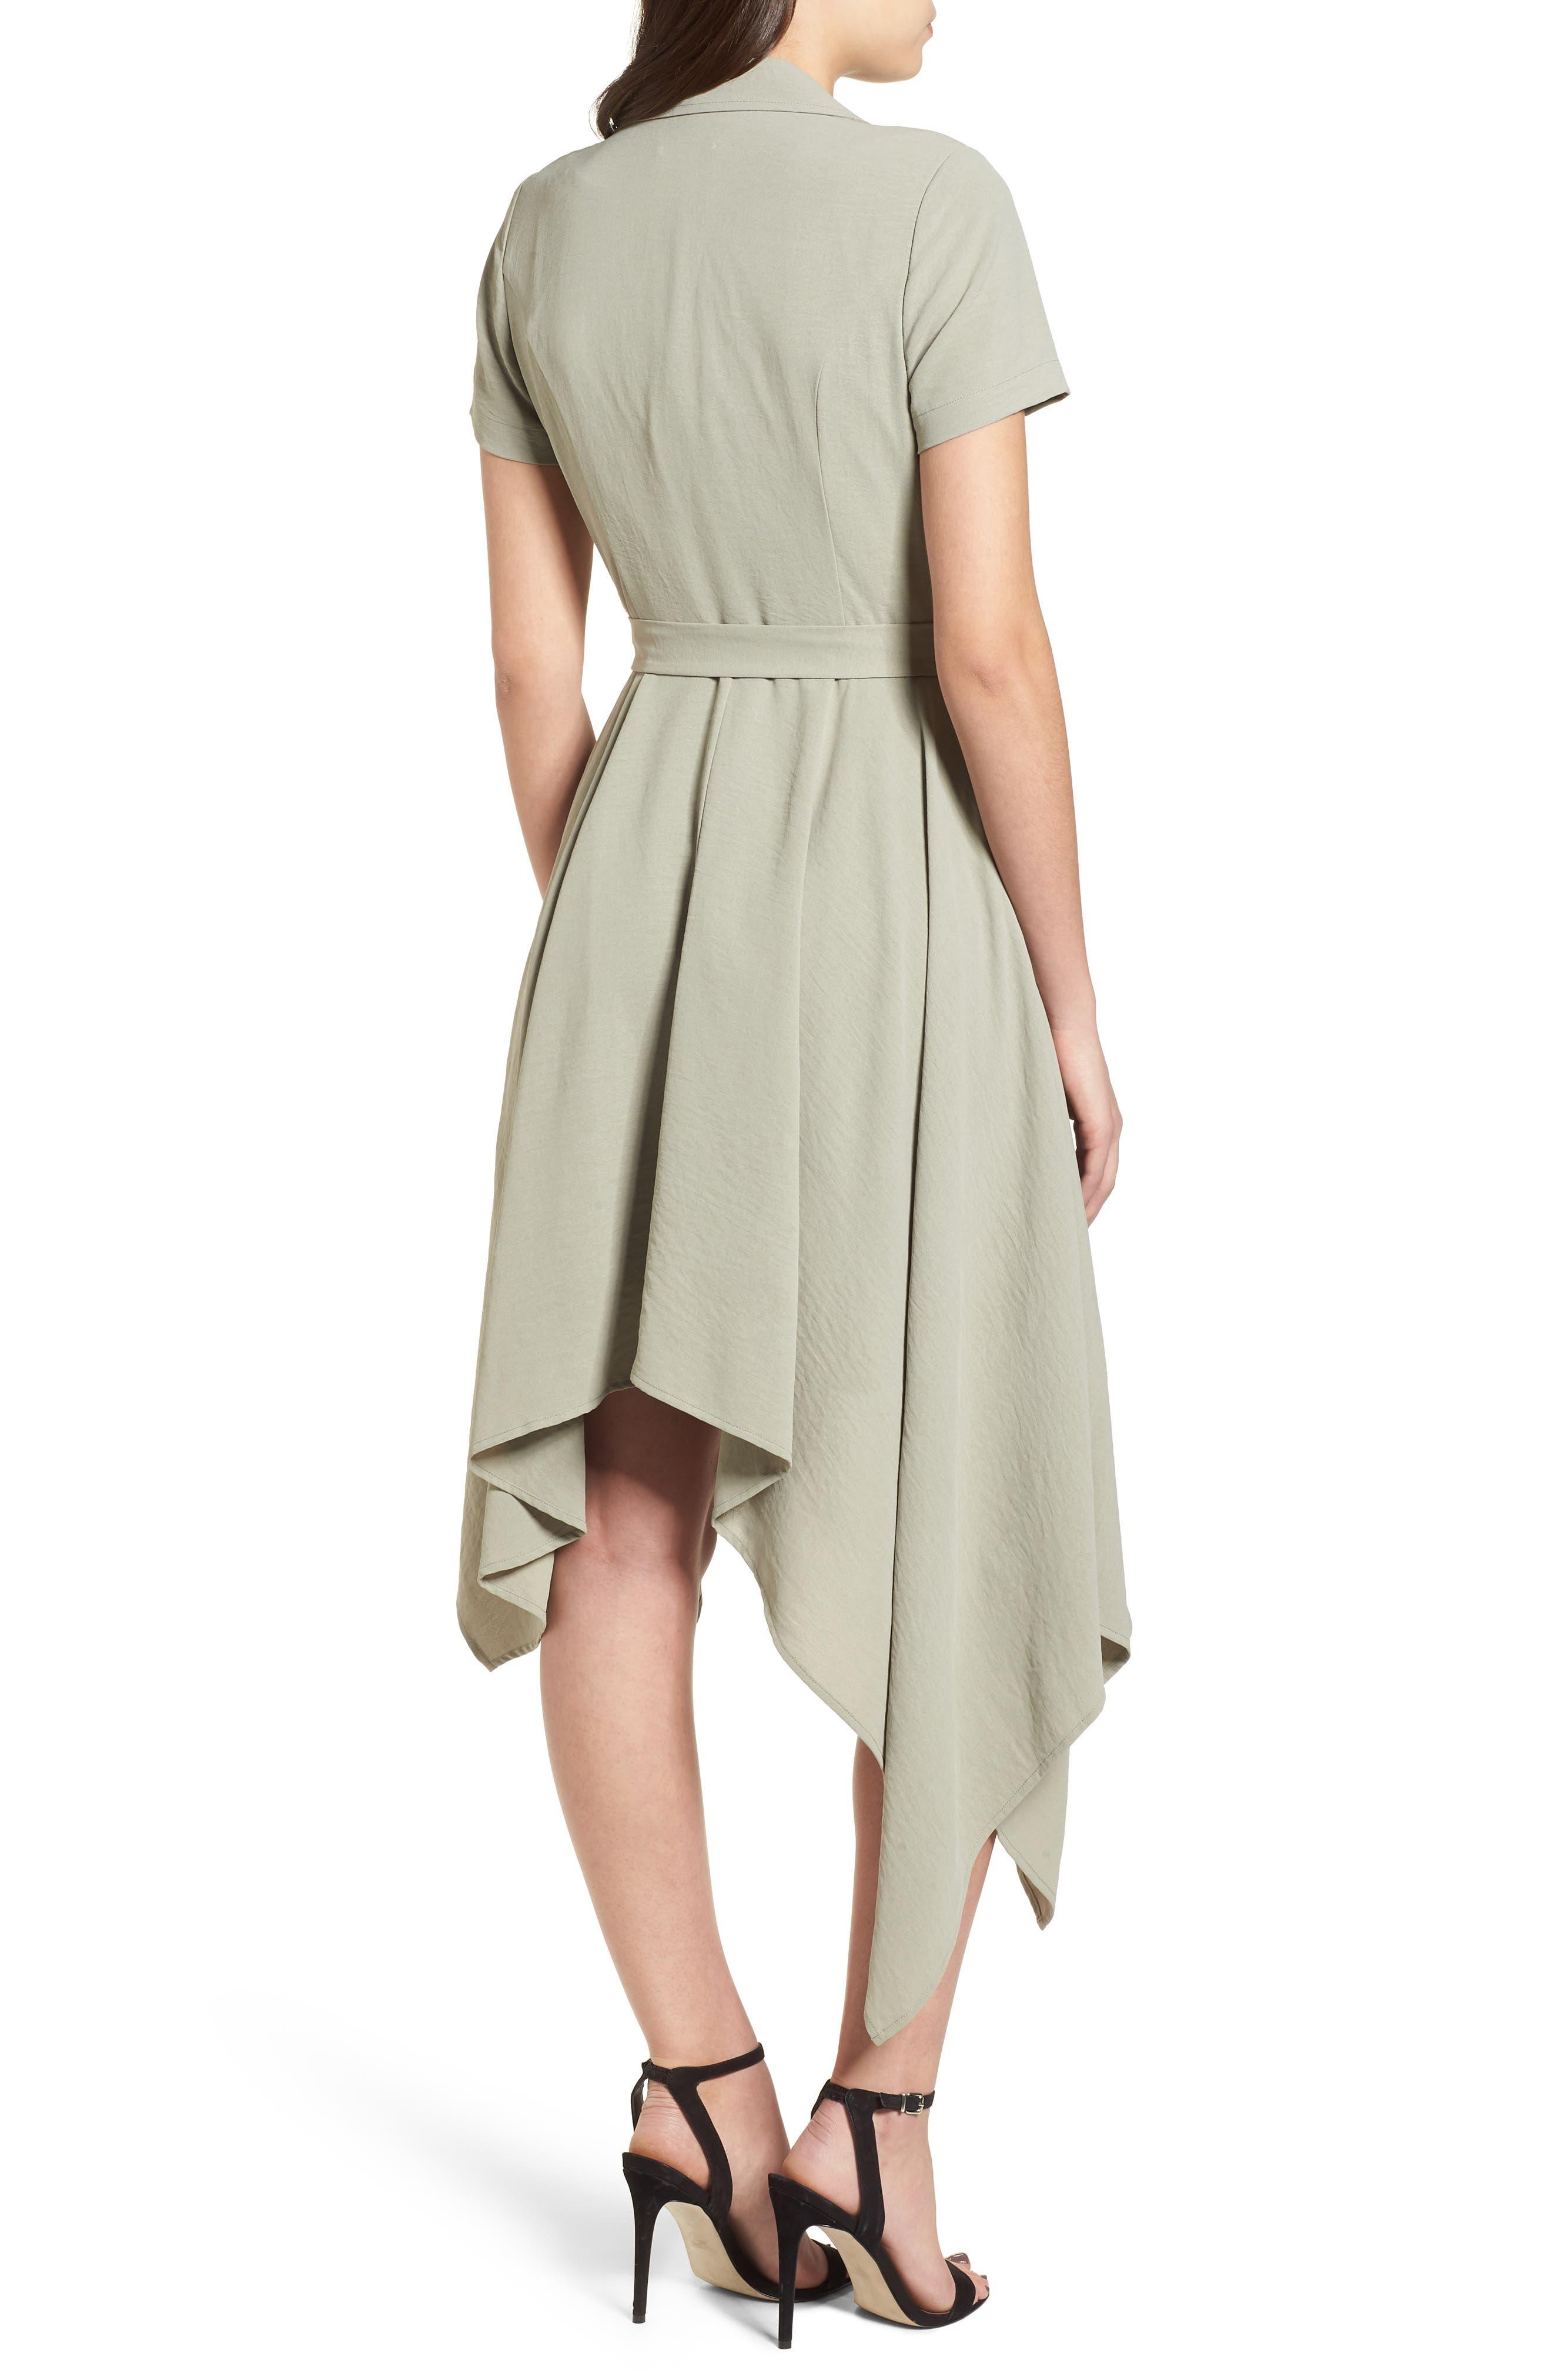 Chriselle x J.O.A. Asymmetrical Trench Dress,                             Alternate thumbnail 2, color,                             300